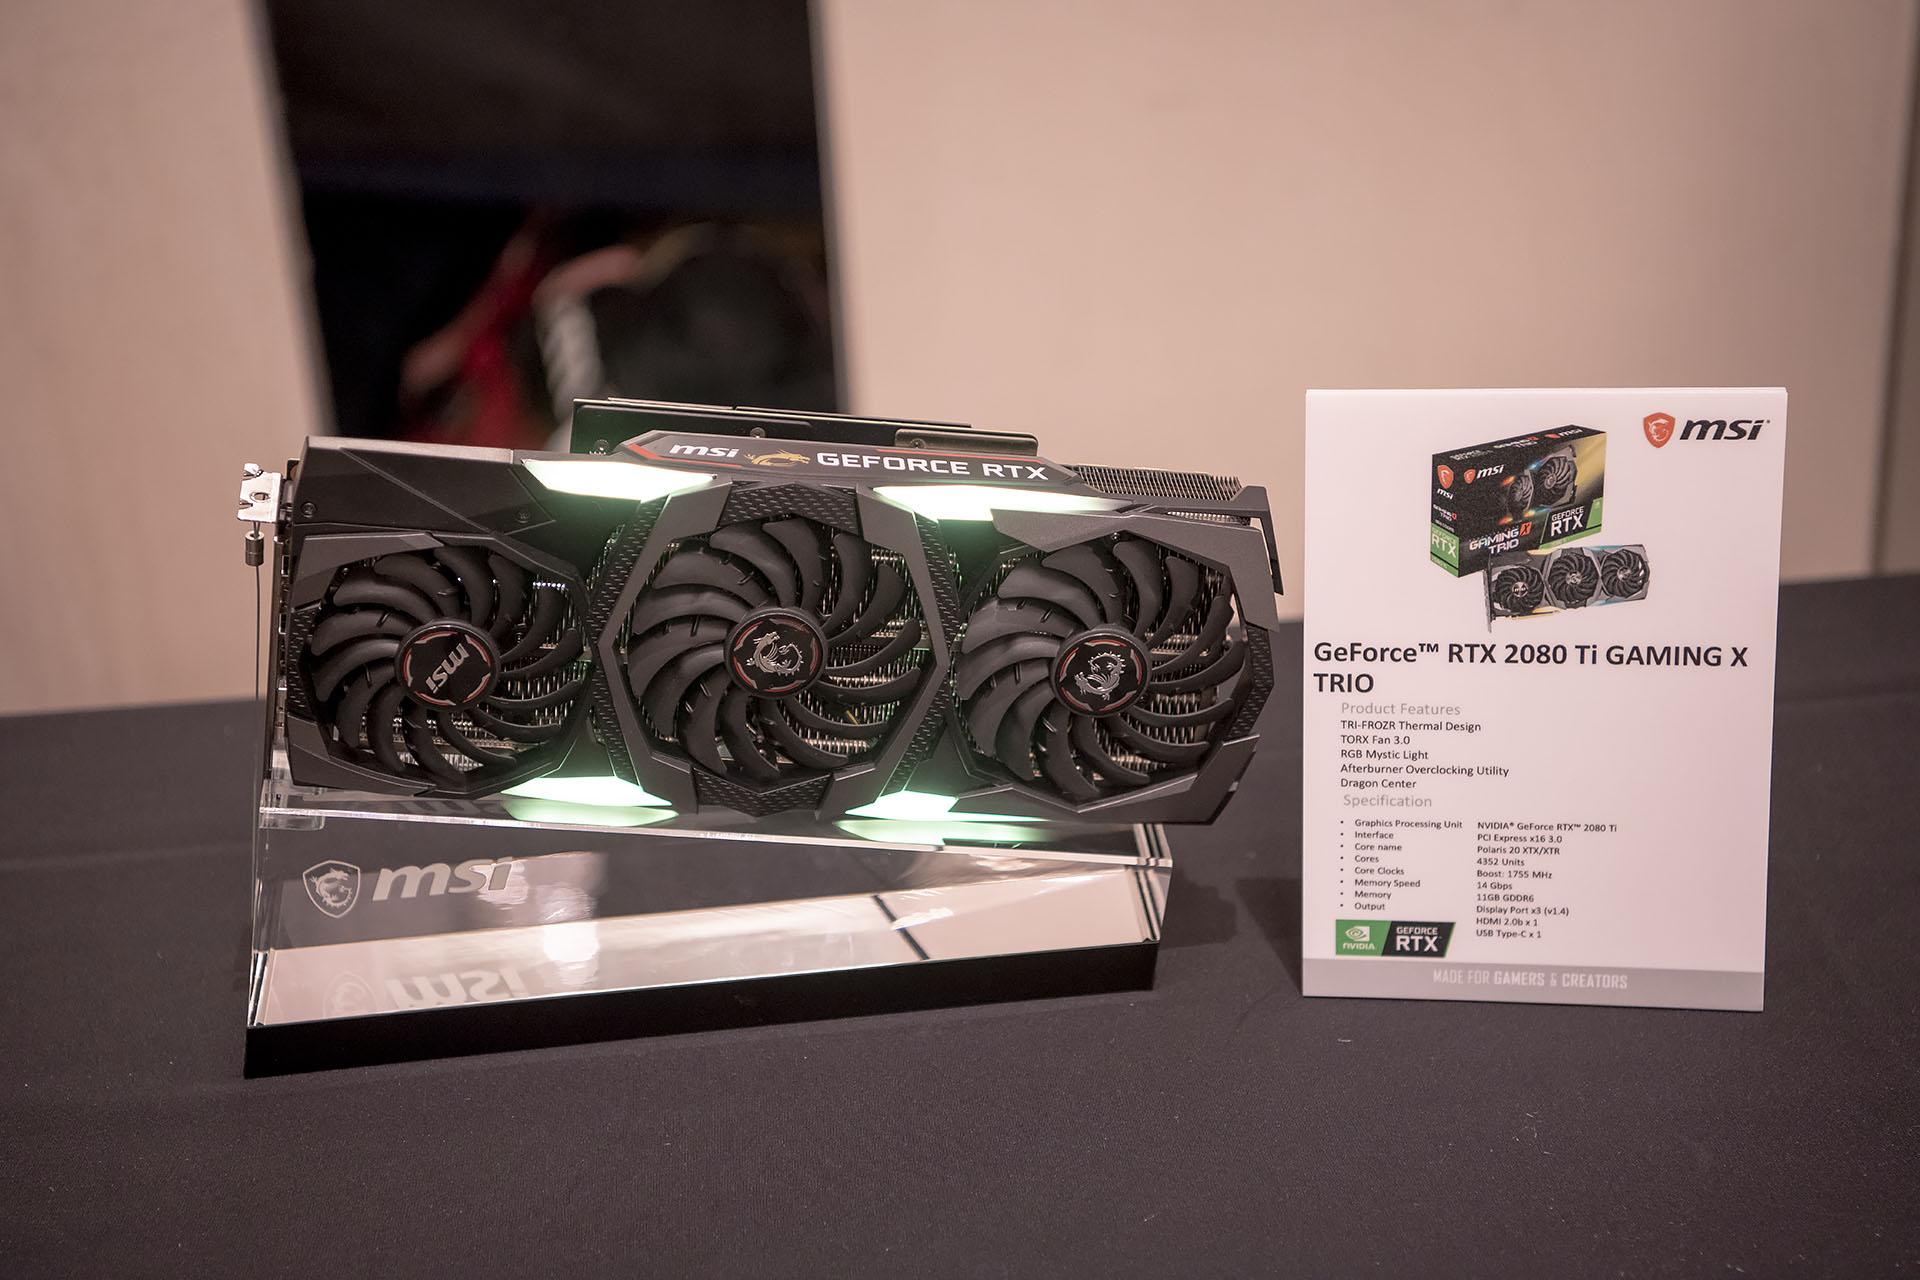 dsc 4783 บรรยากาศงาน MSI Indo Pacific X570 Partner Convention พบการเปิดตัวเมนบอร์ด X570 รุ่นใหม่ล่าสุดจากทาง MSI ต้อนรับการมาของซีพียู AMD RYZEN 3000ซีรี่ย์